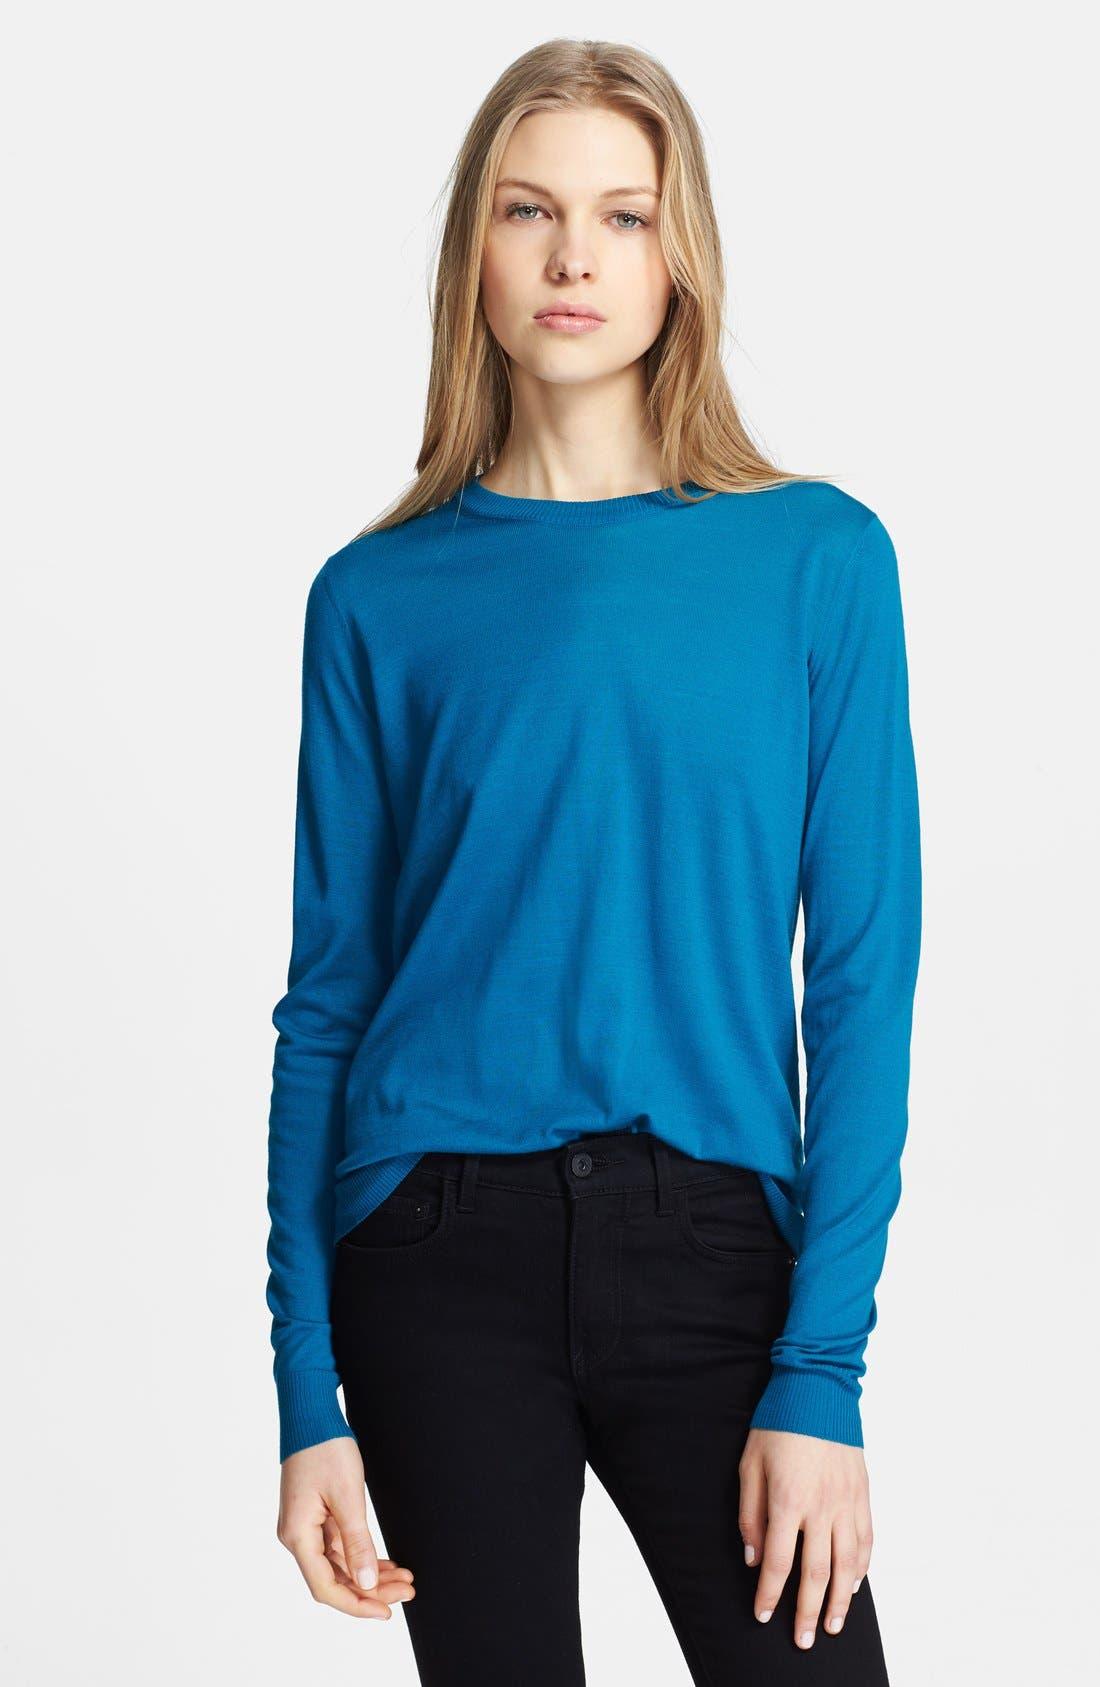 Main Image - Proenza Schouler Superfine Merino Wool Sweater